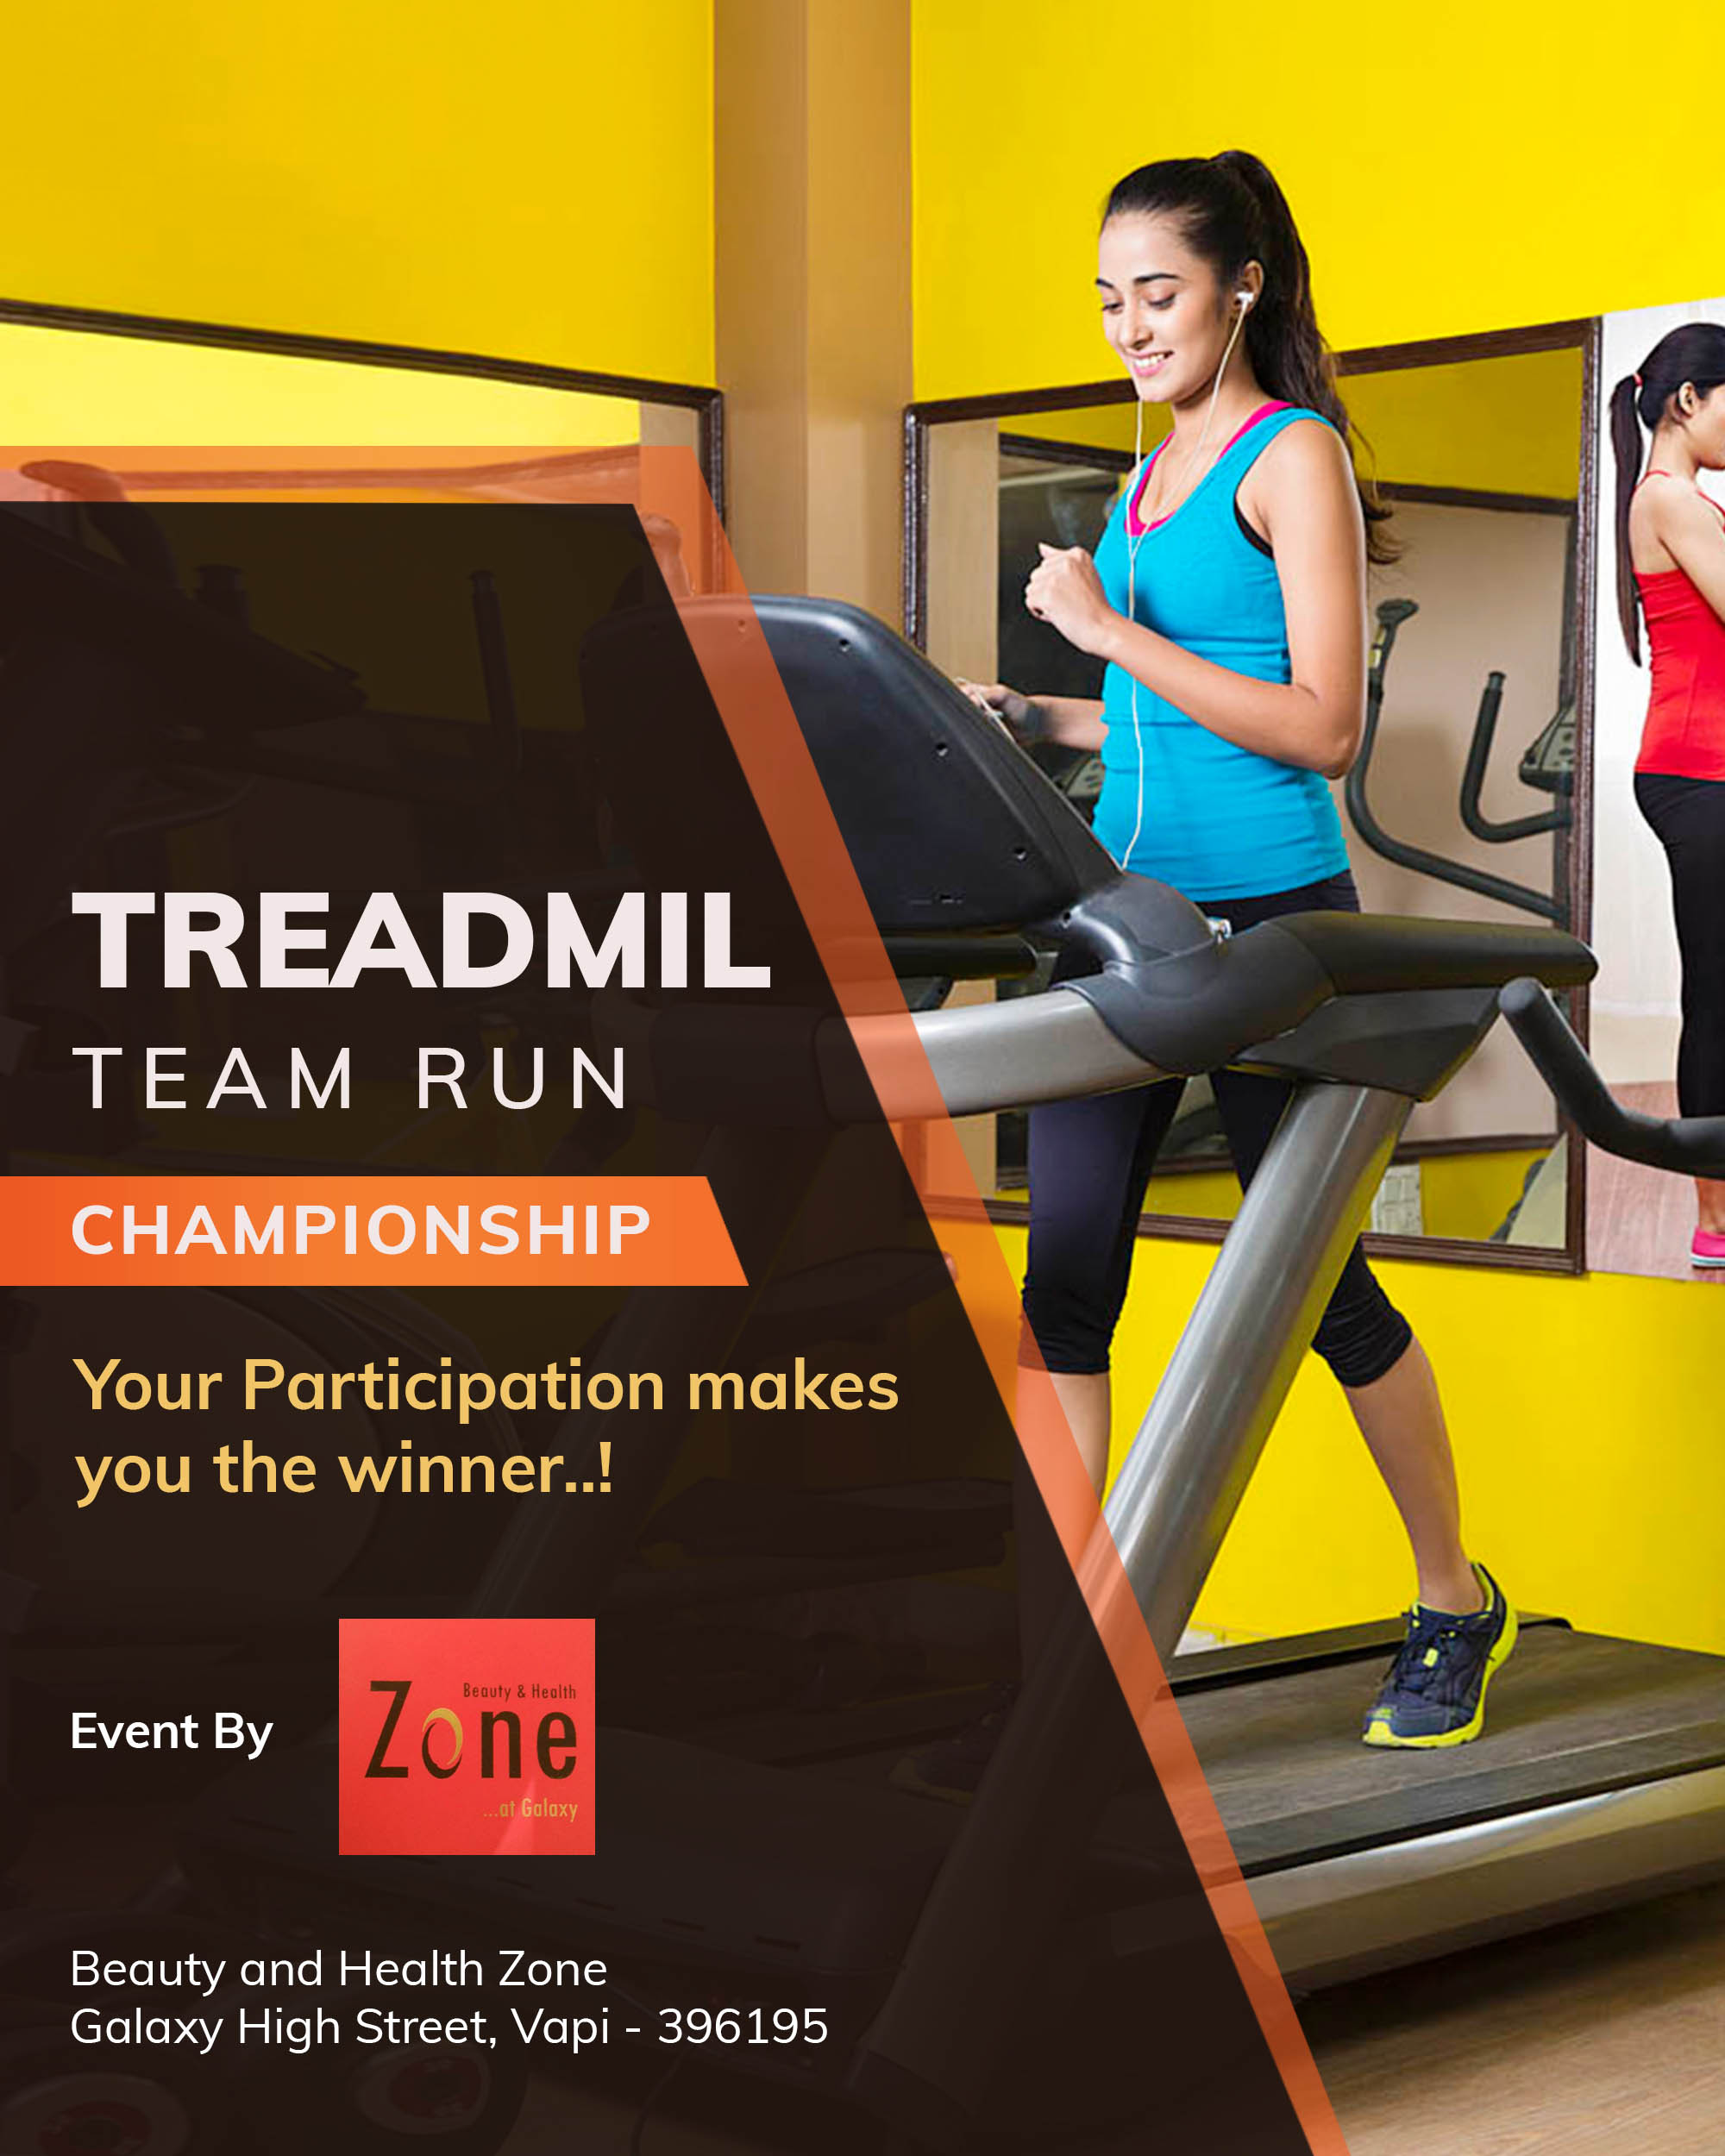 Treadmil Team Run